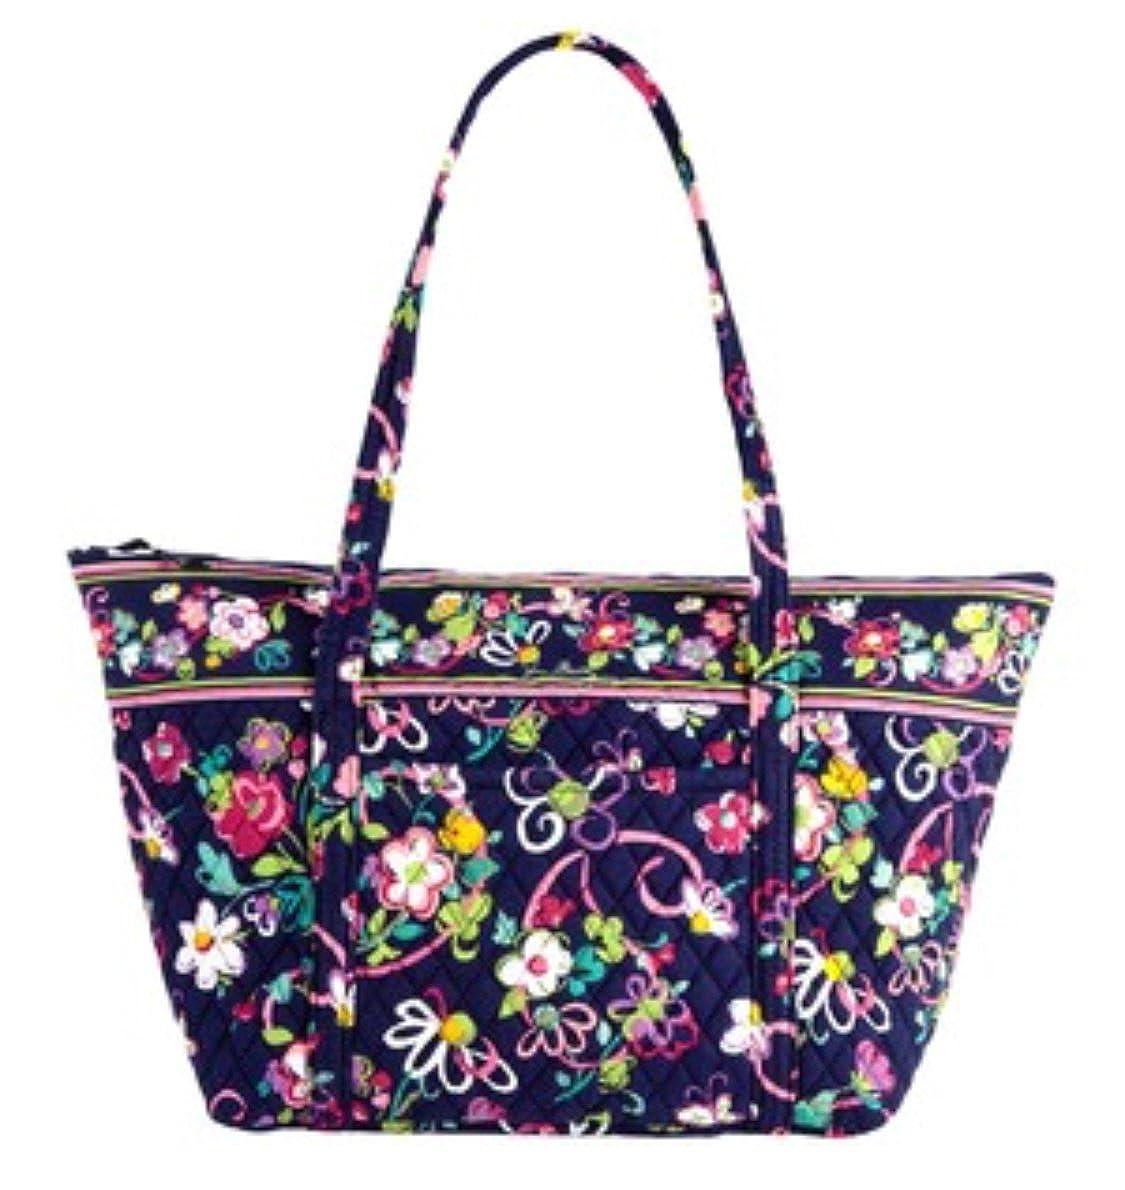 a344189cba Vera Bradley Luggage Womens Miller Bag African Violet 18229-165 ...